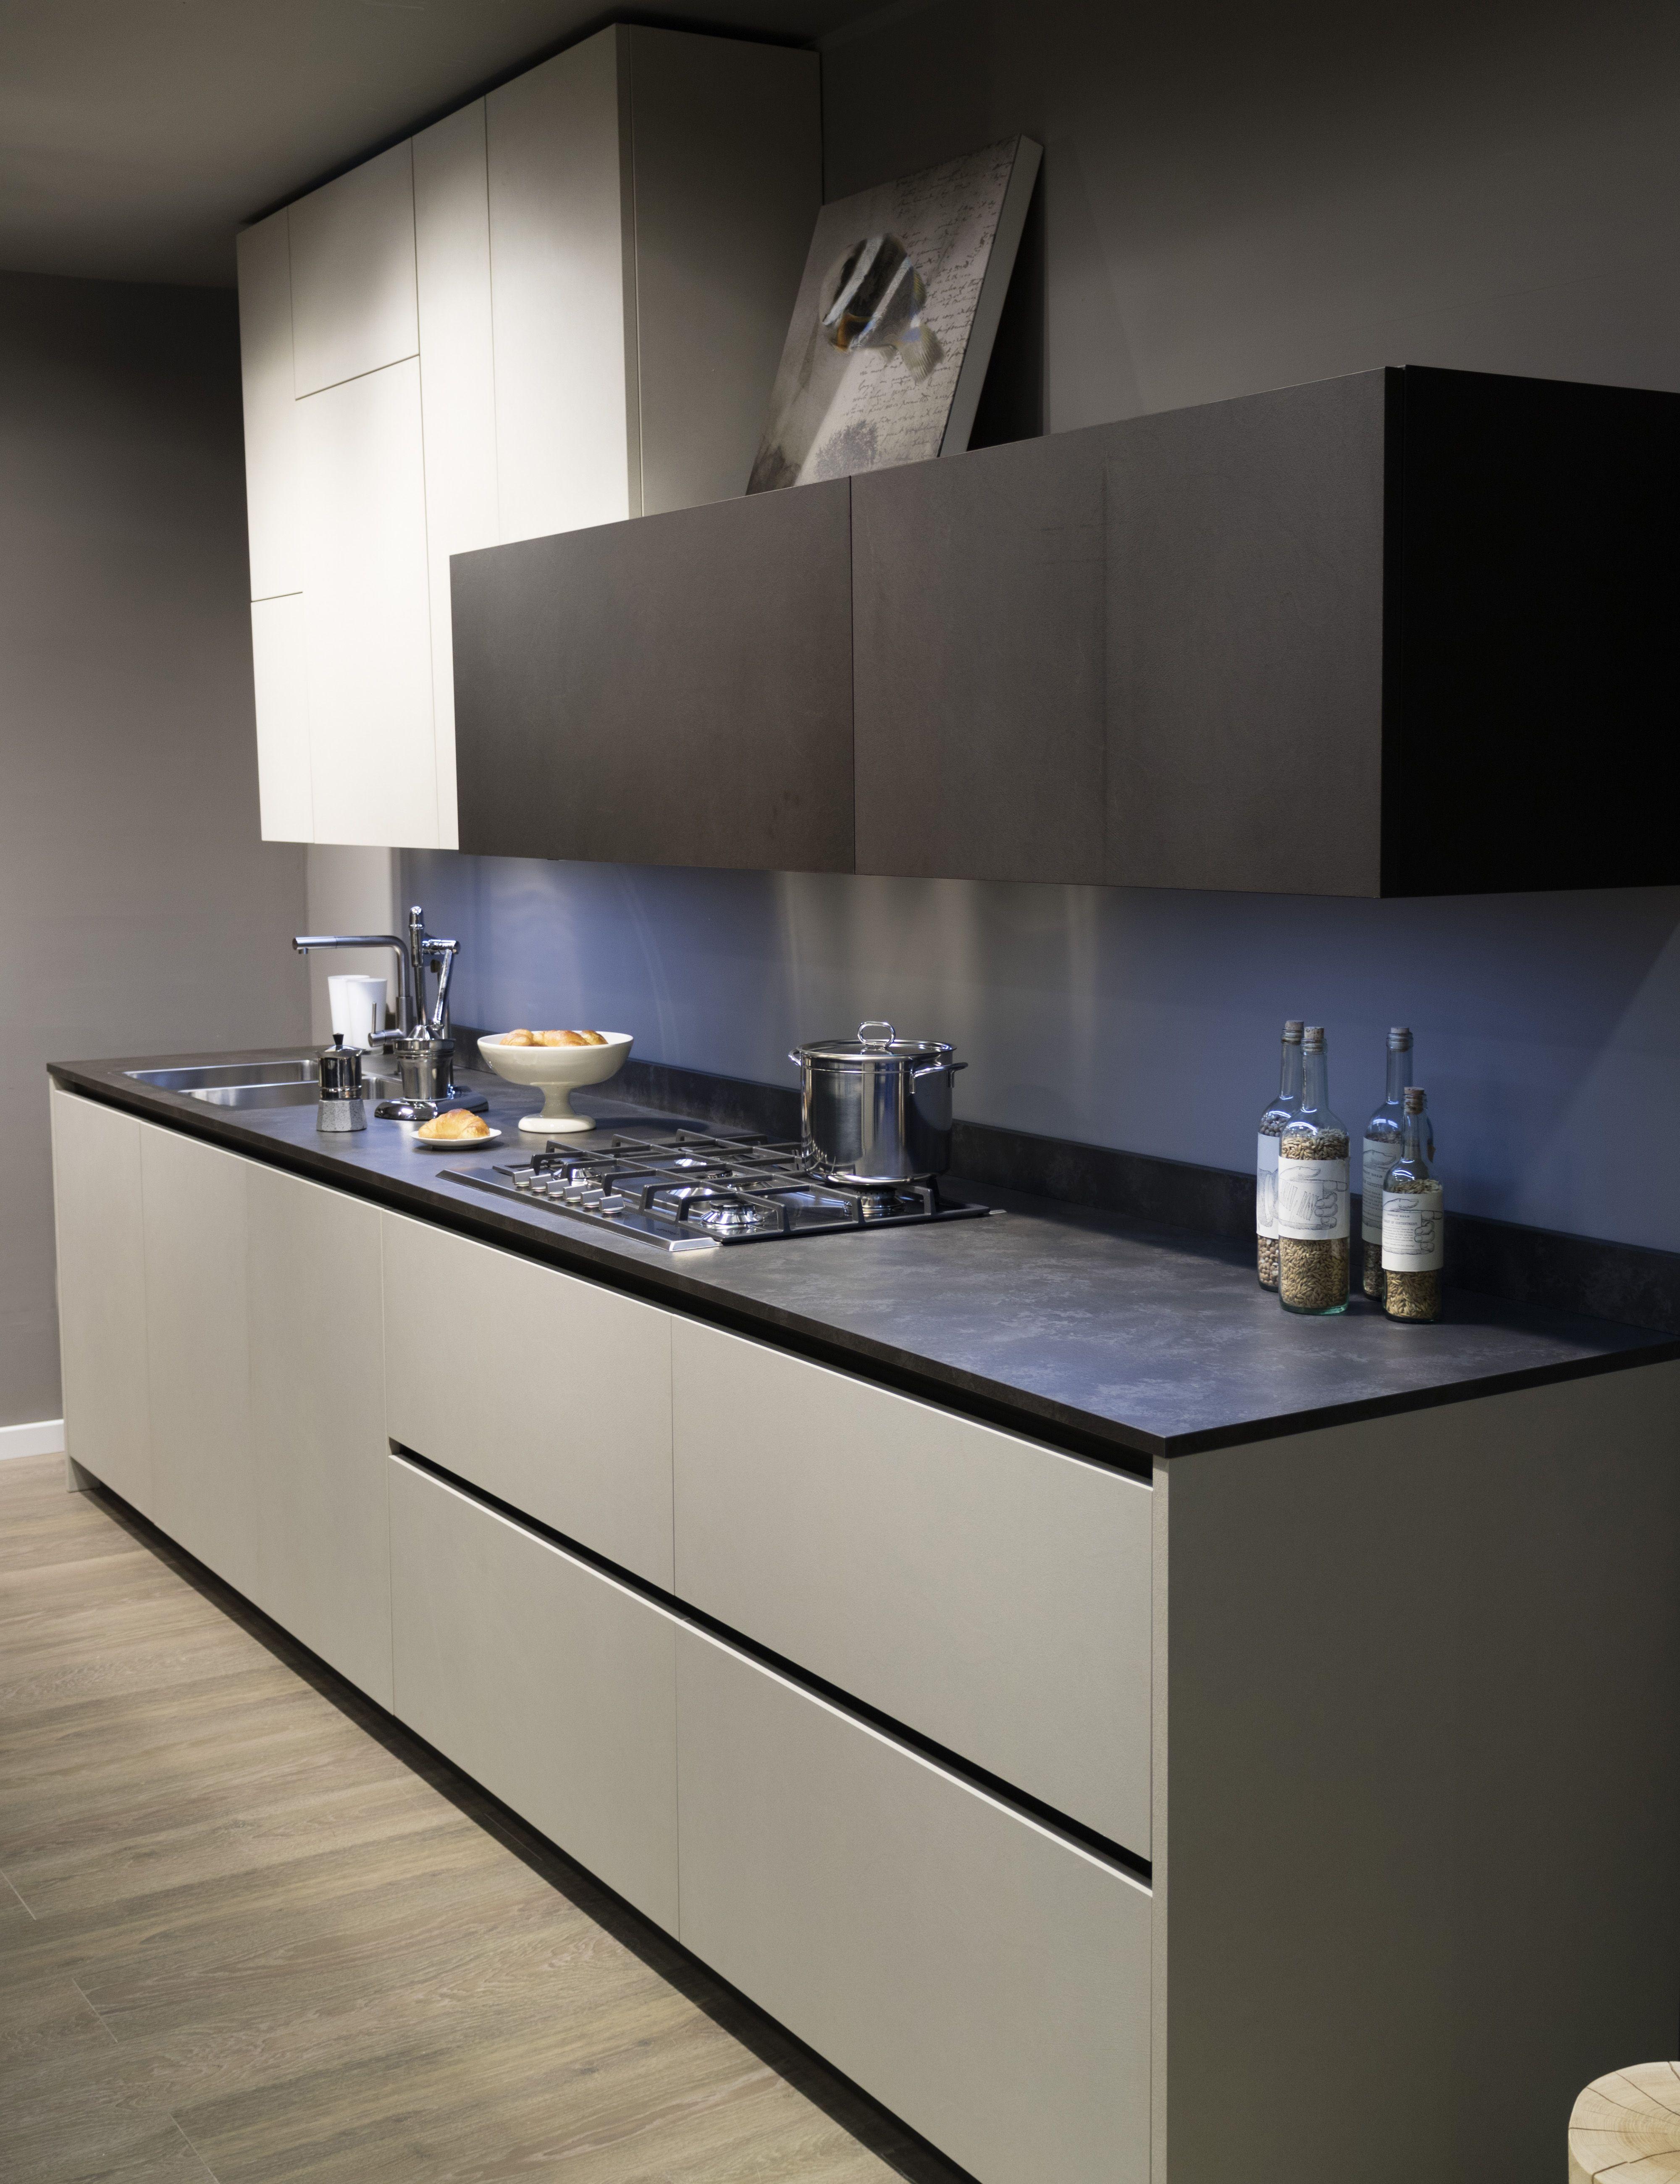 Cucina Design Moderno Arredamento Isola Italiana Penisola Top